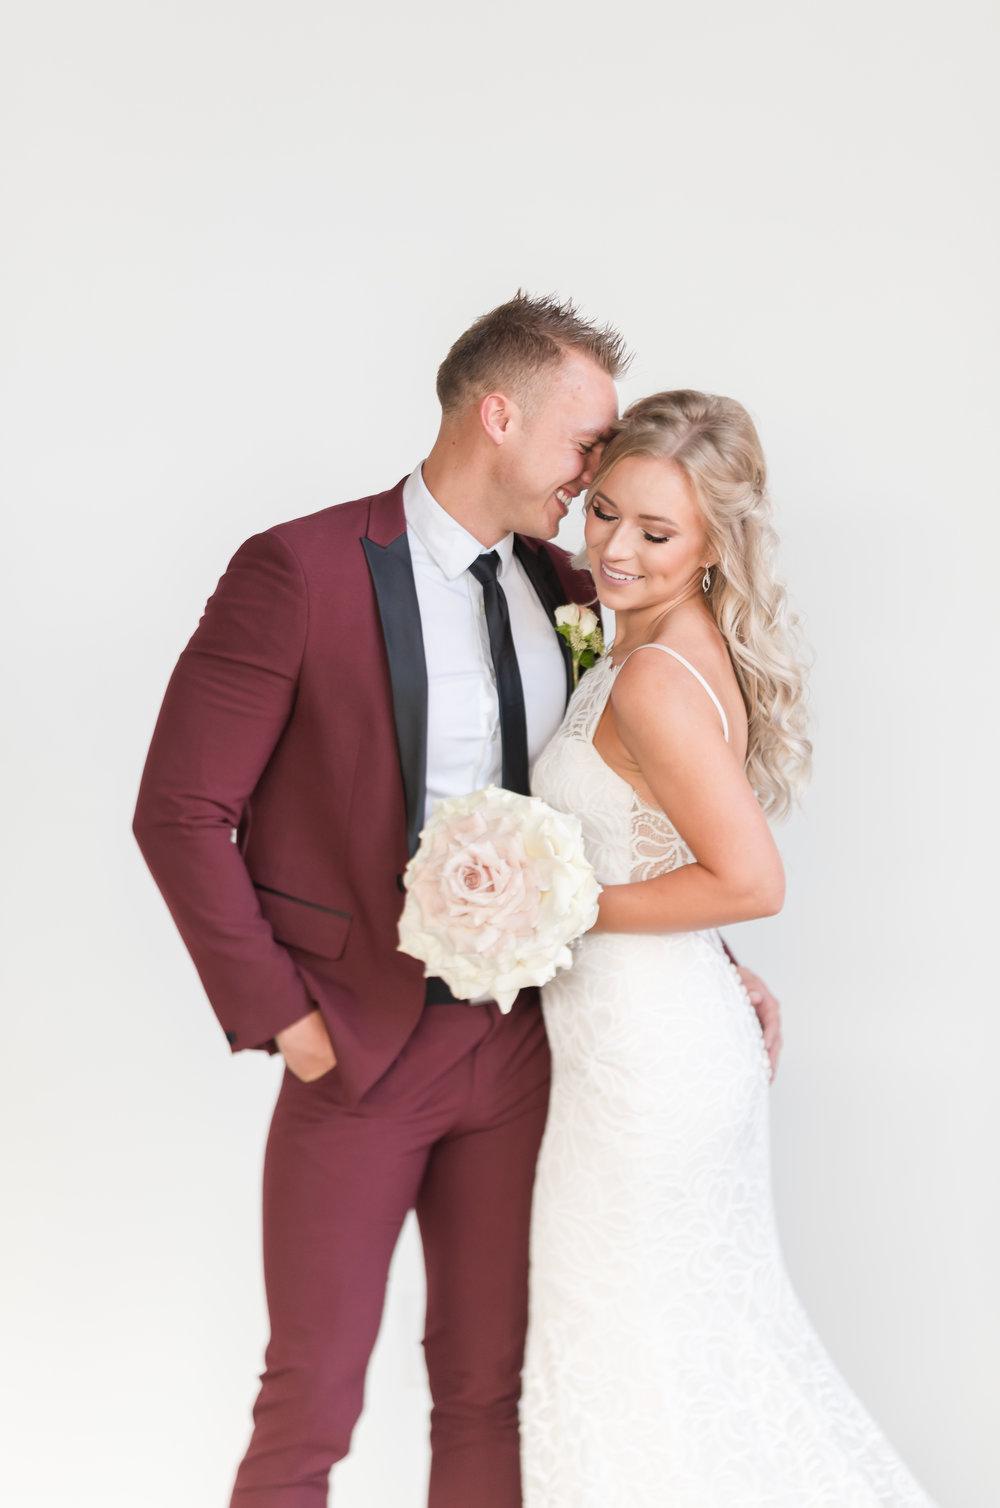 Wedding Photography_Rakoteet Photography 76.jpg